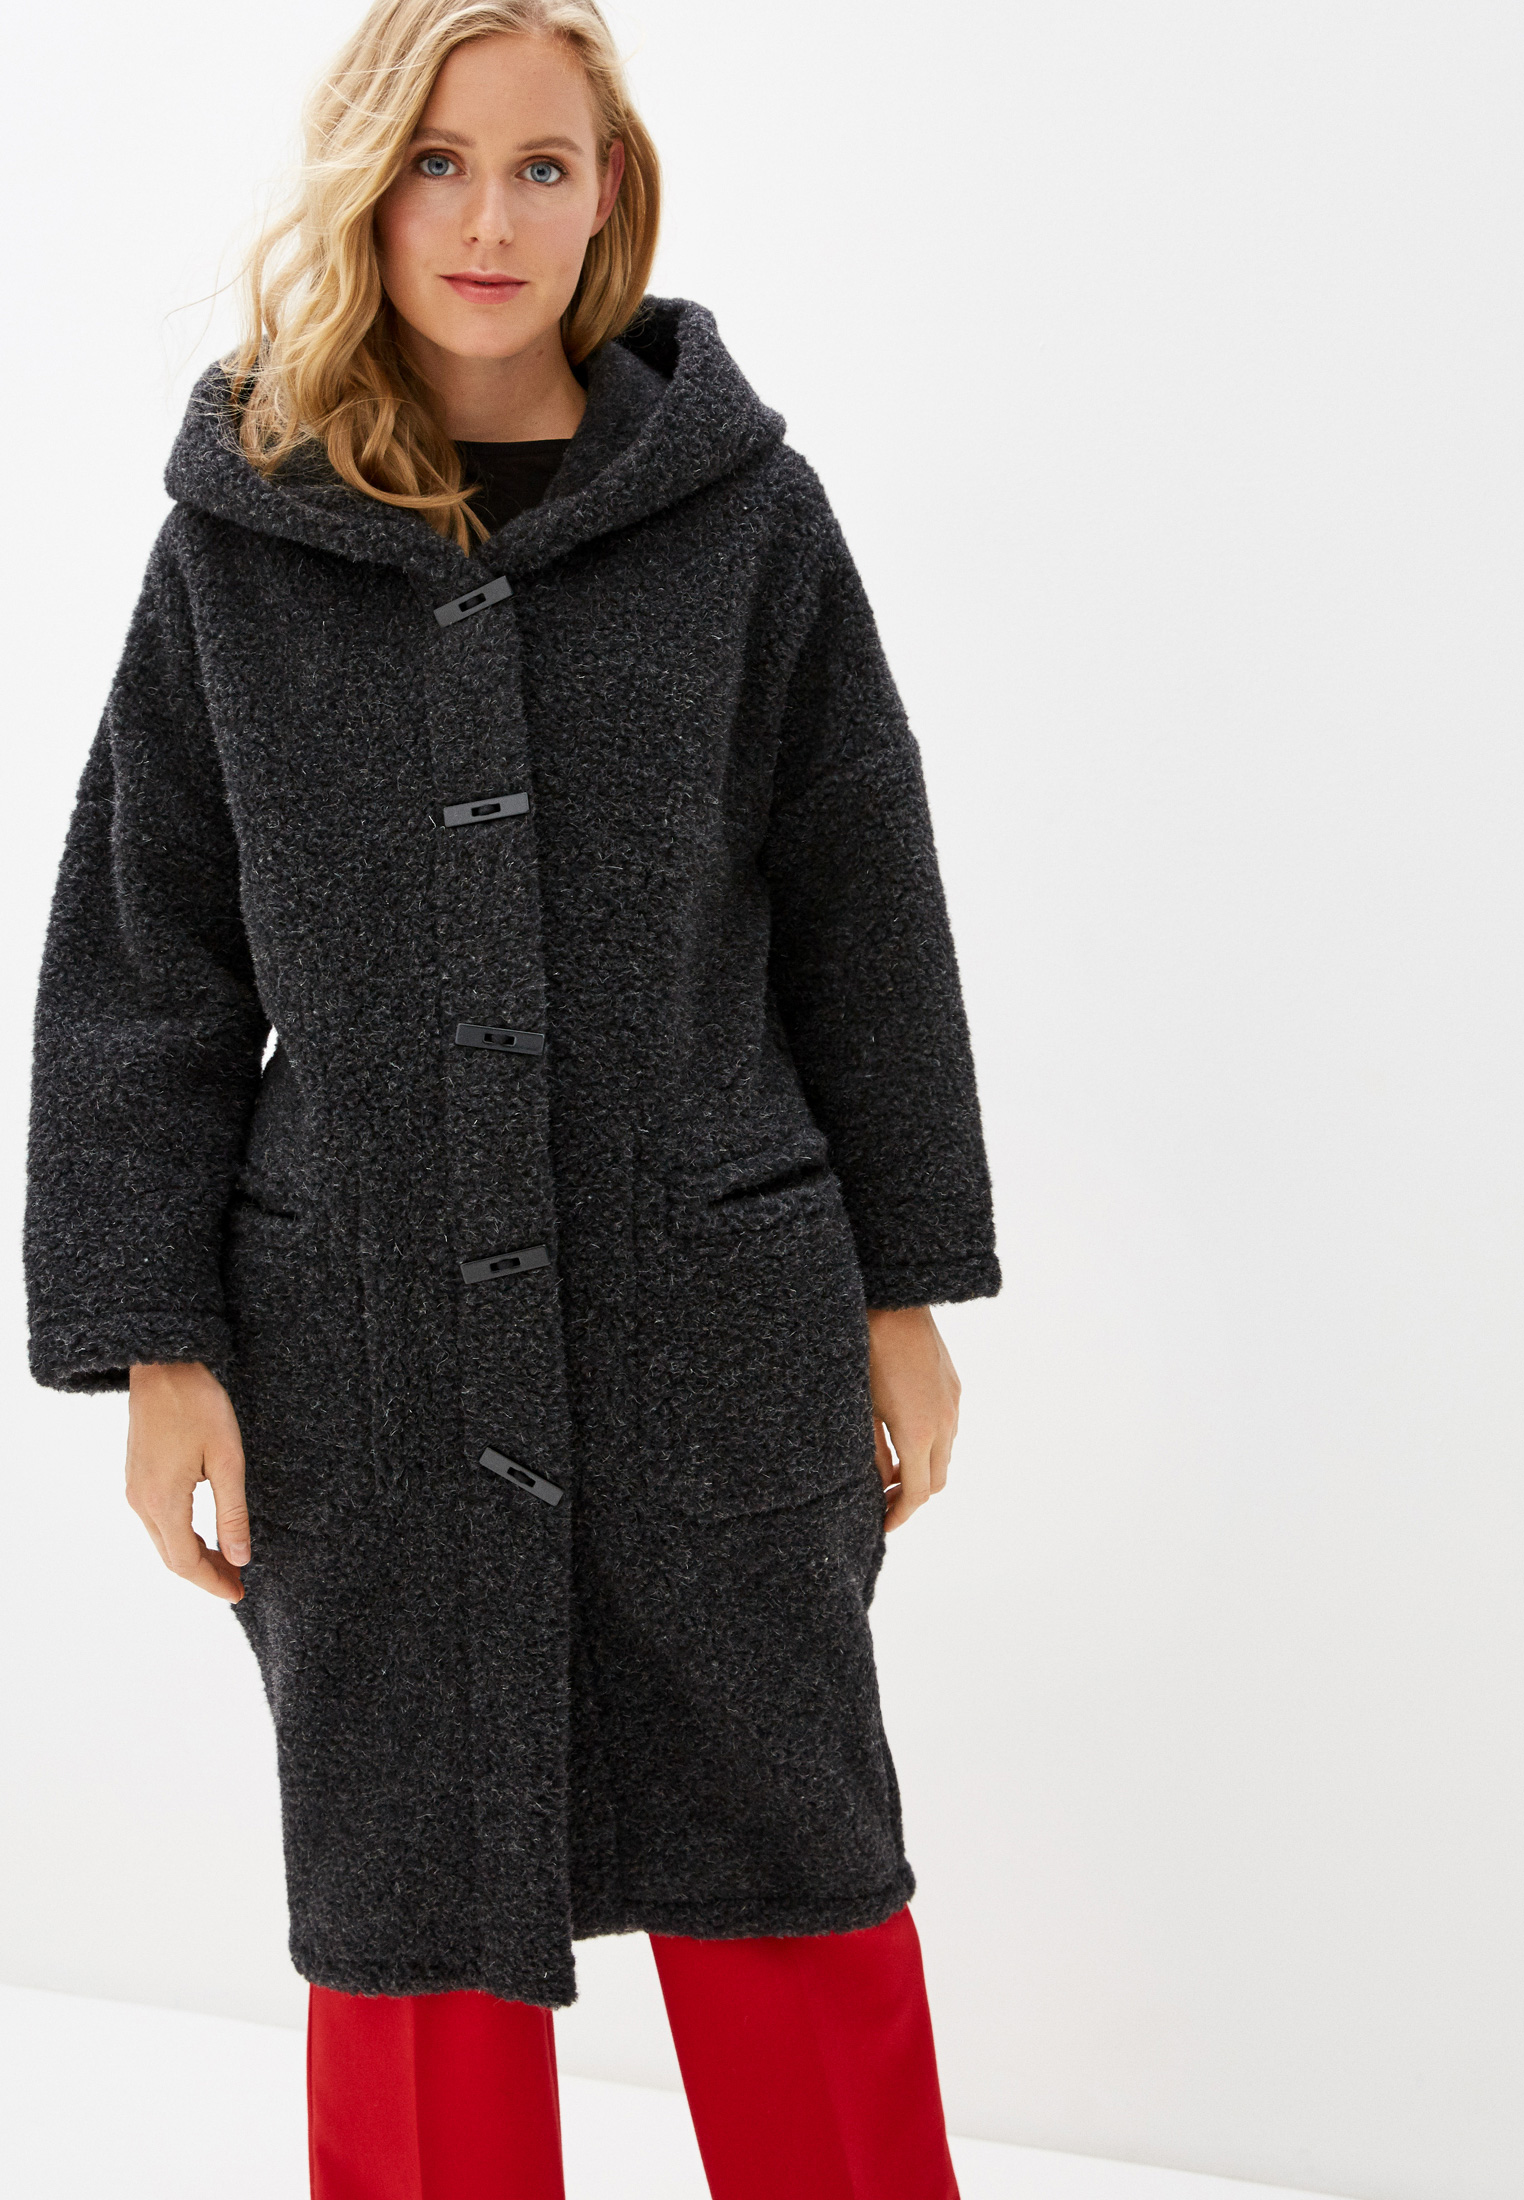 Пальто Alwero ALEXA WOOL за 10 450 ₽. в интернет-магазине Lamoda.ru